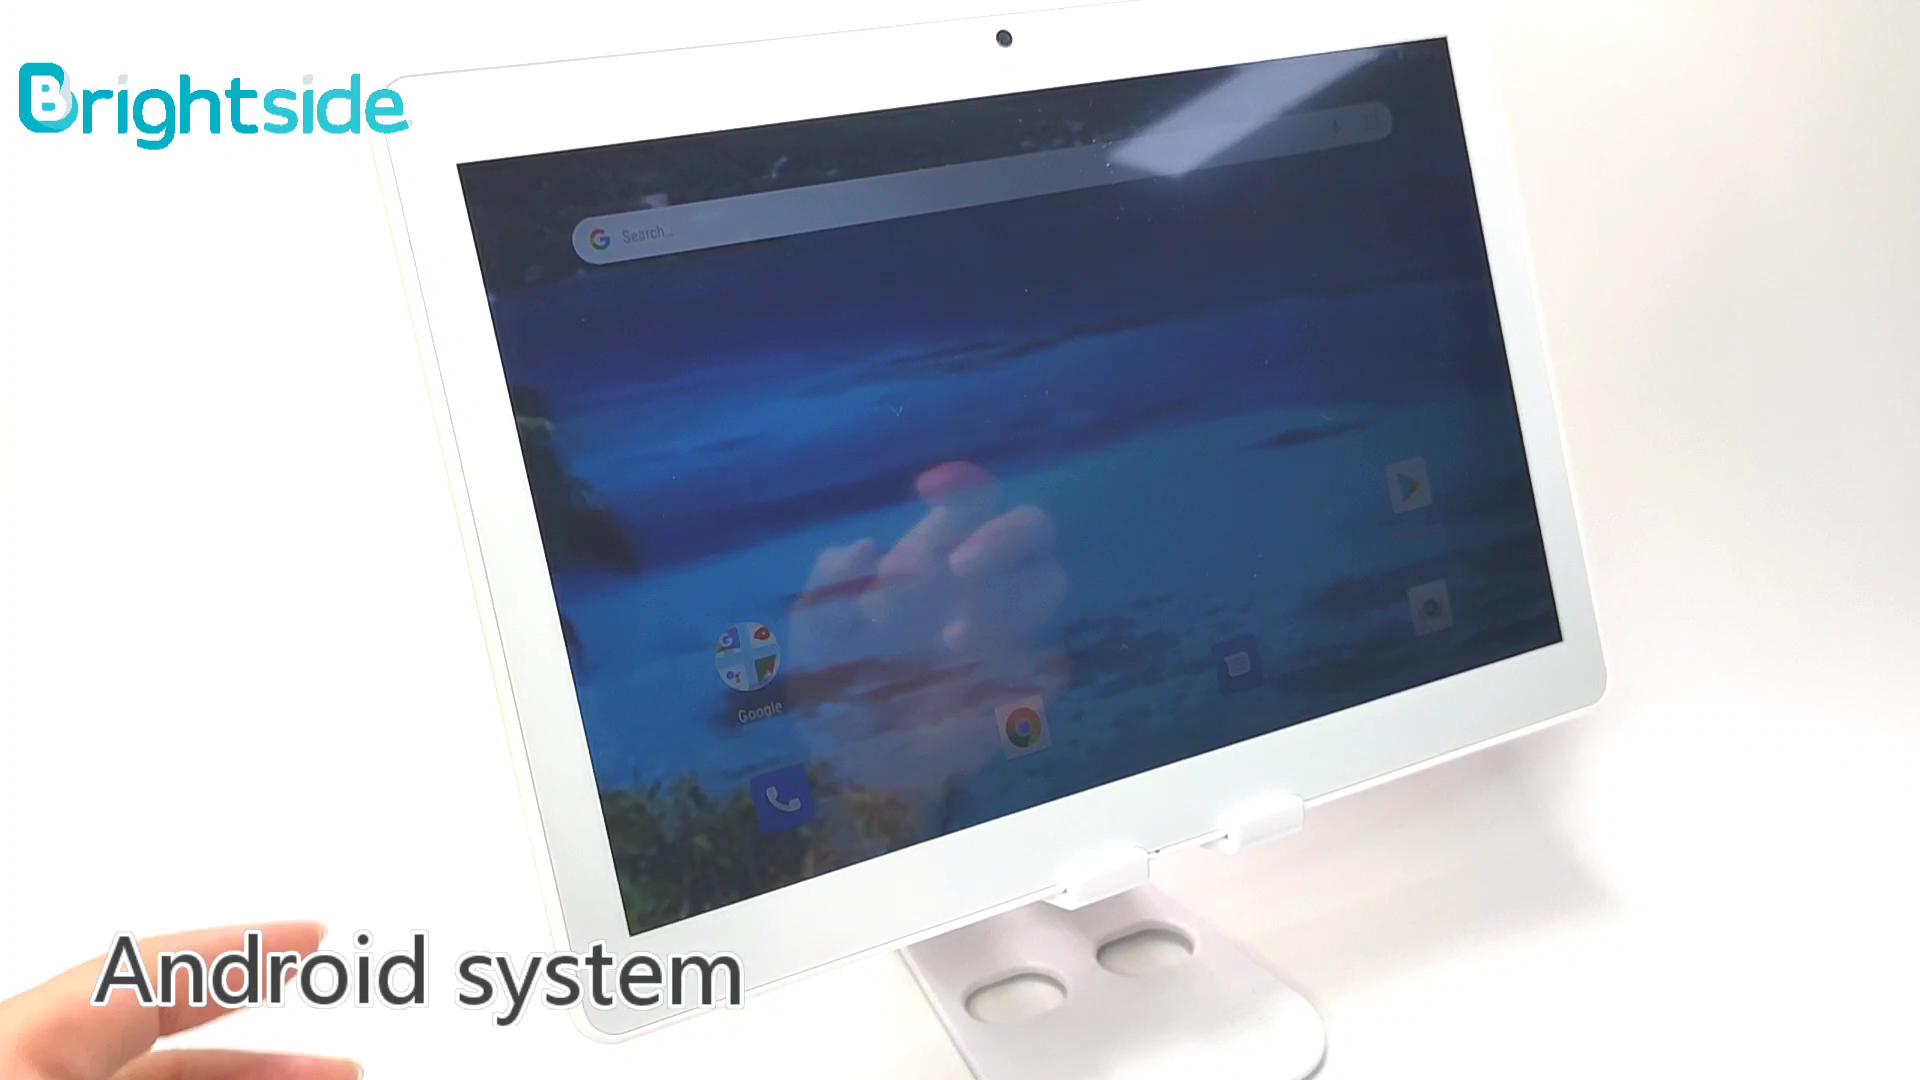 Brightside fcc ceritifcation yüksek kaliteli 10 inç android tablet sim 3g eğitim tablet pc